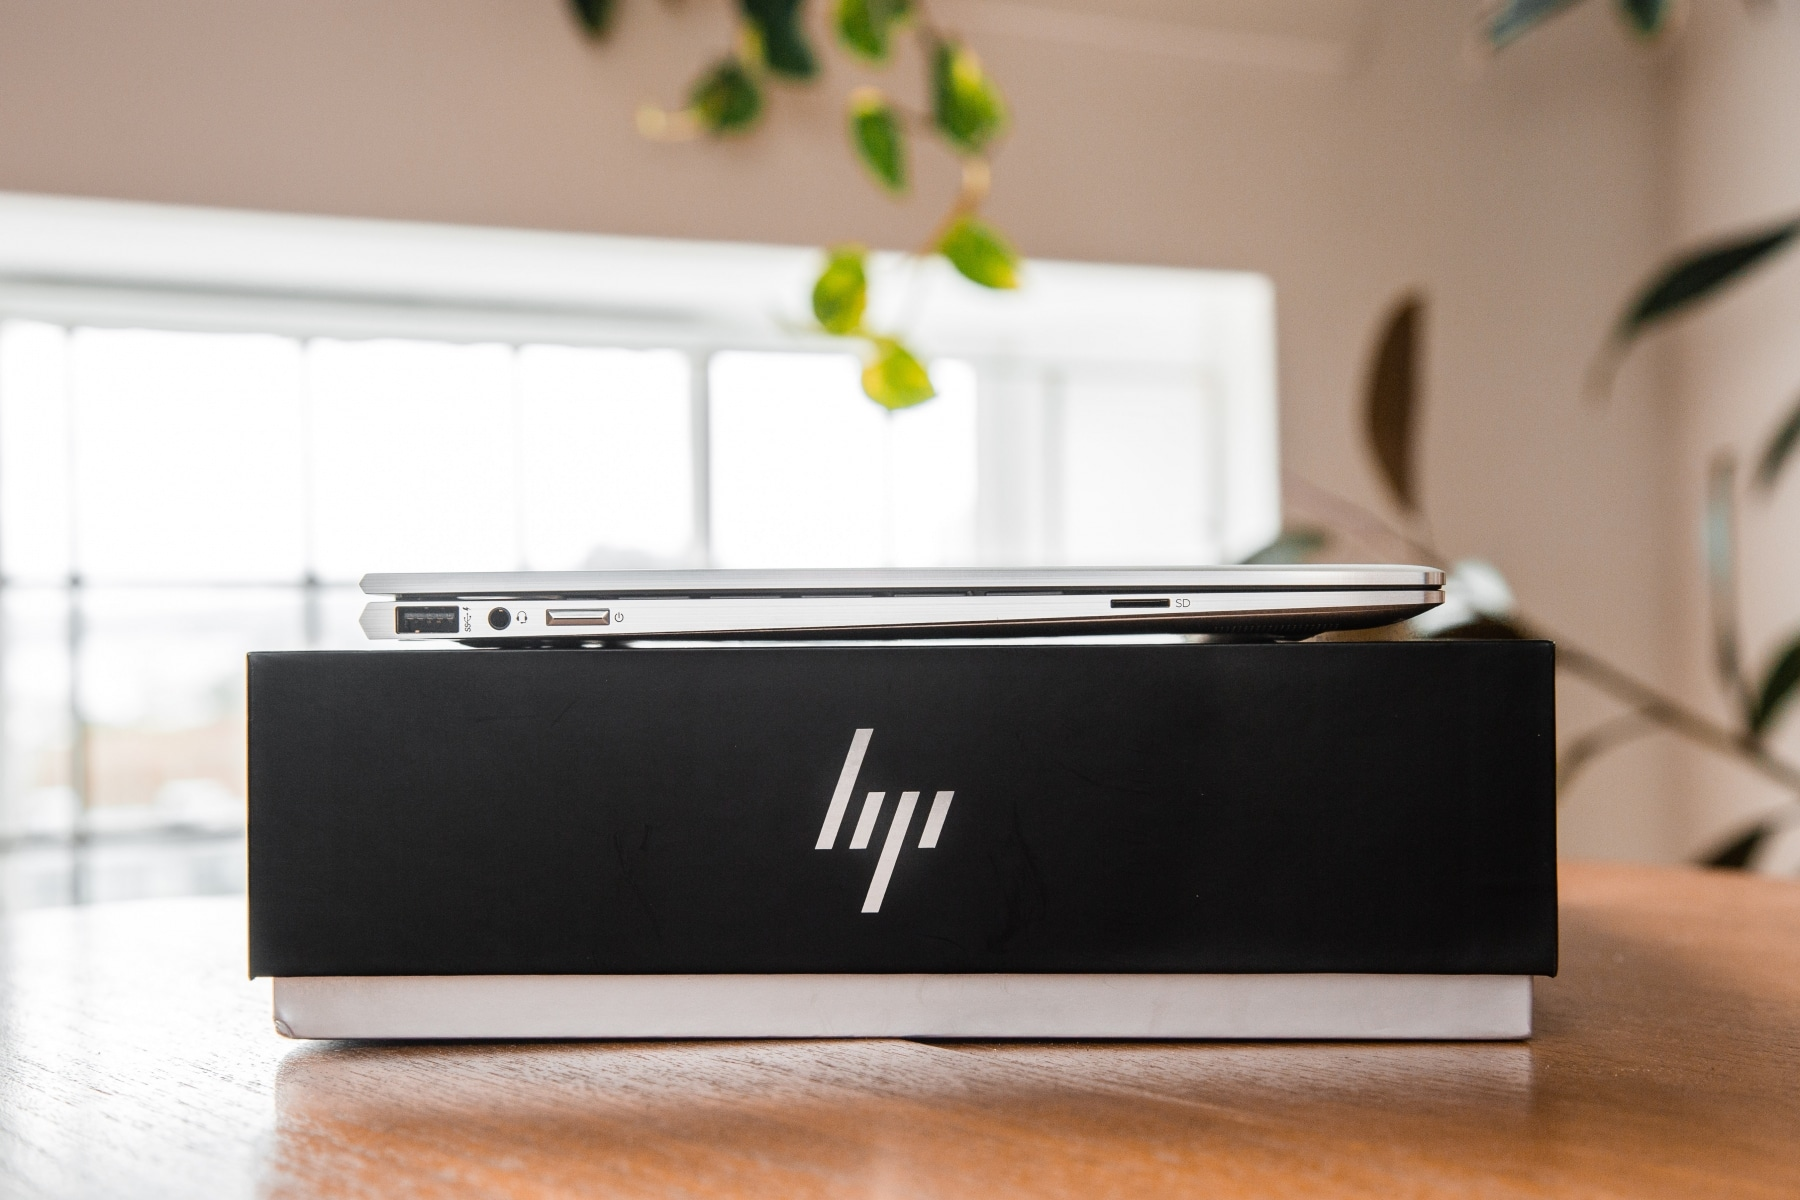 hp spectre x360 convertible laptop on box